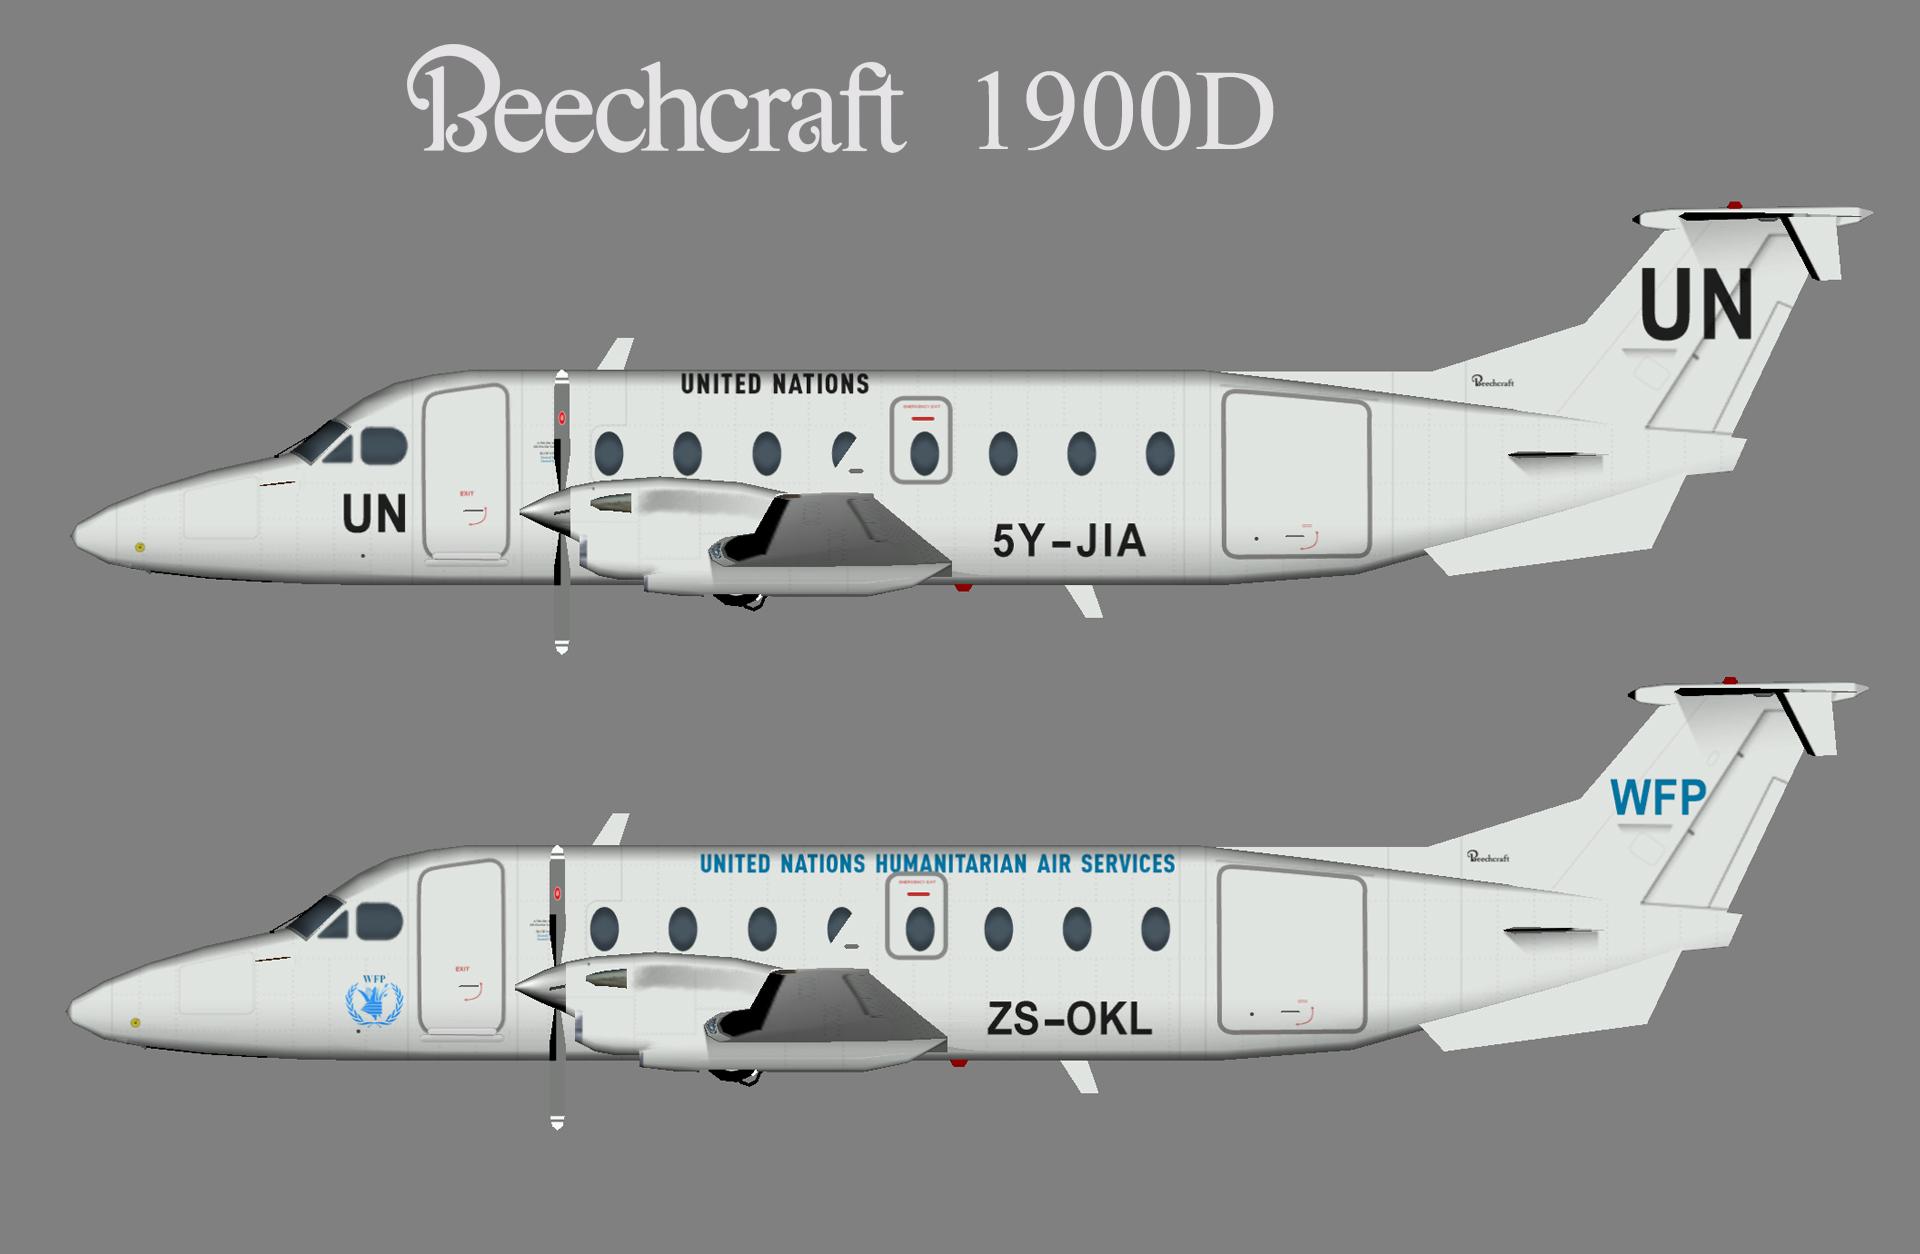 United Nations Beechcraft 1900D